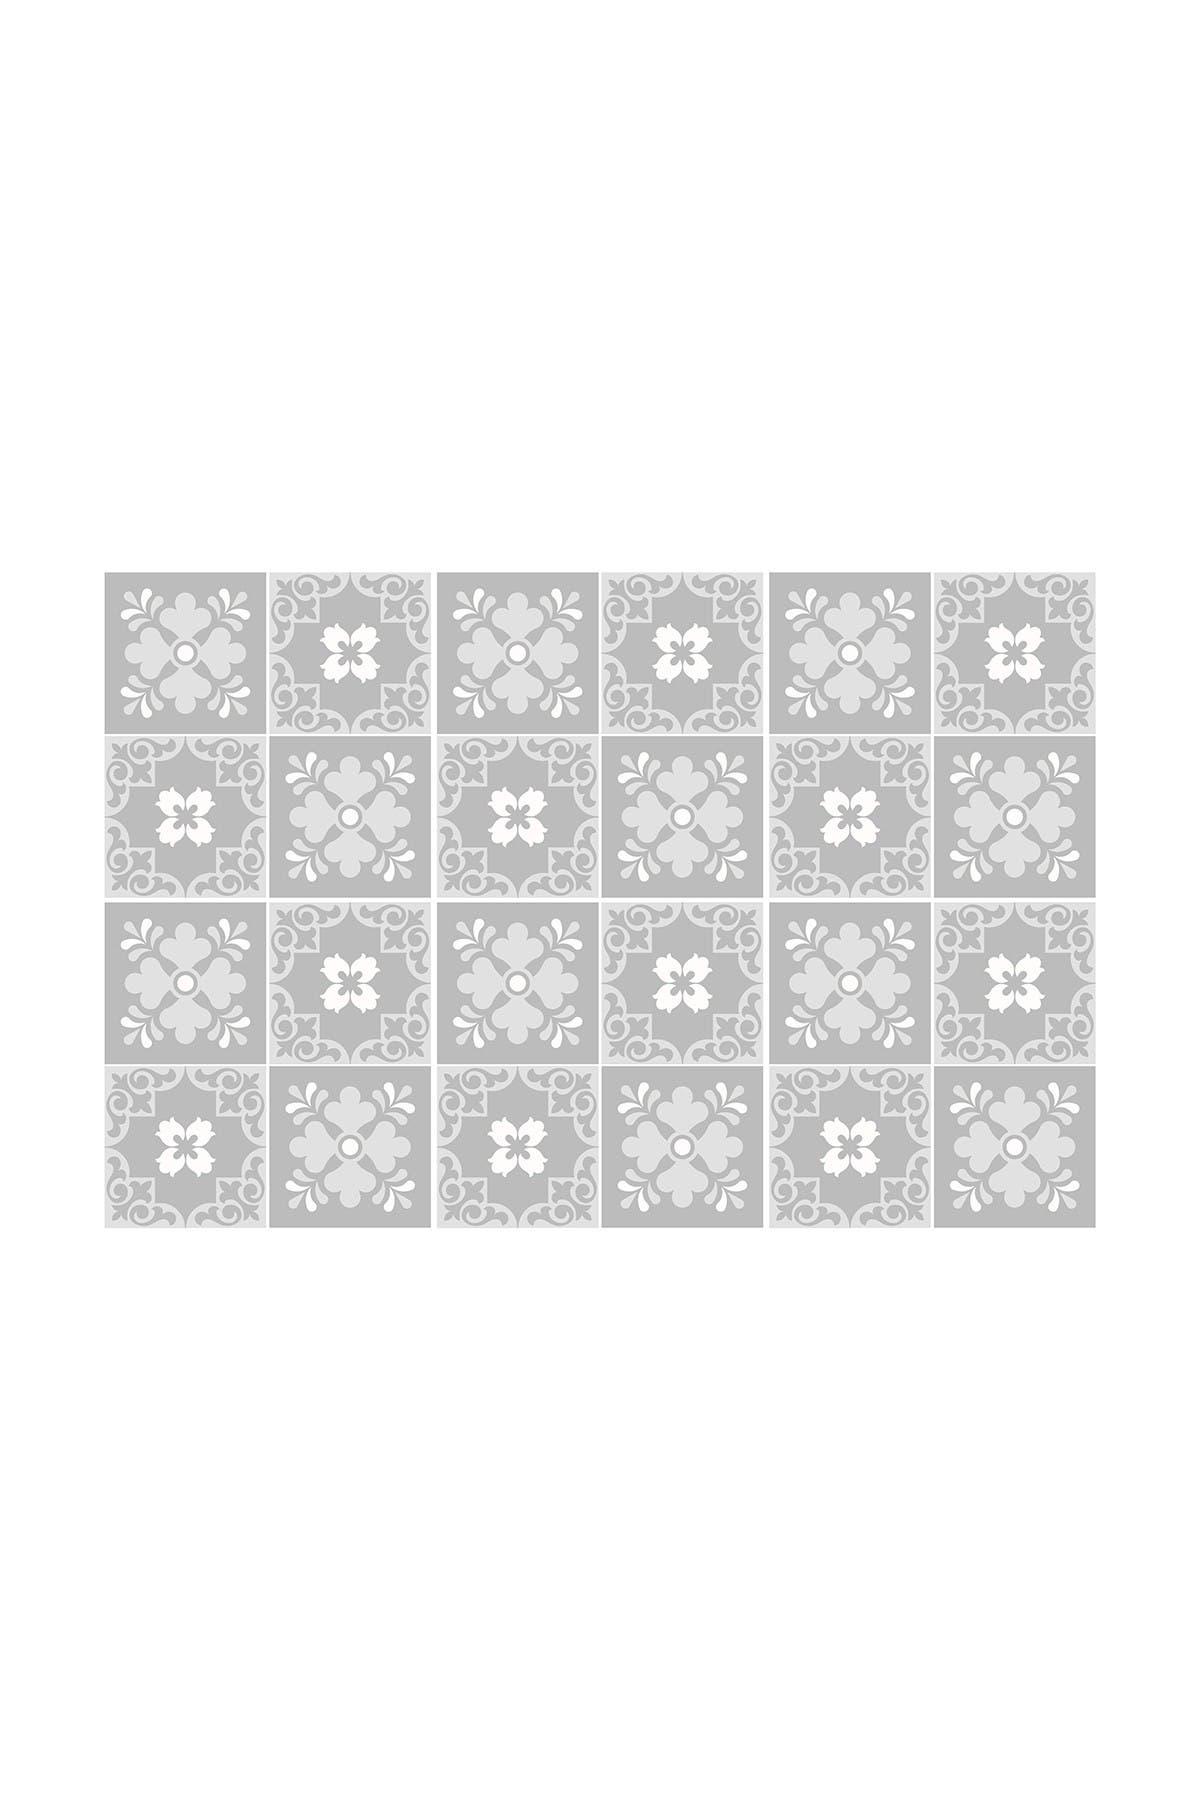 "Image of WalPlus Ginnie Floral Light Grey Victorian Wall Tile Sticker Set - 15cm x 15 cm (6"" x 6"") - 24-Piece"